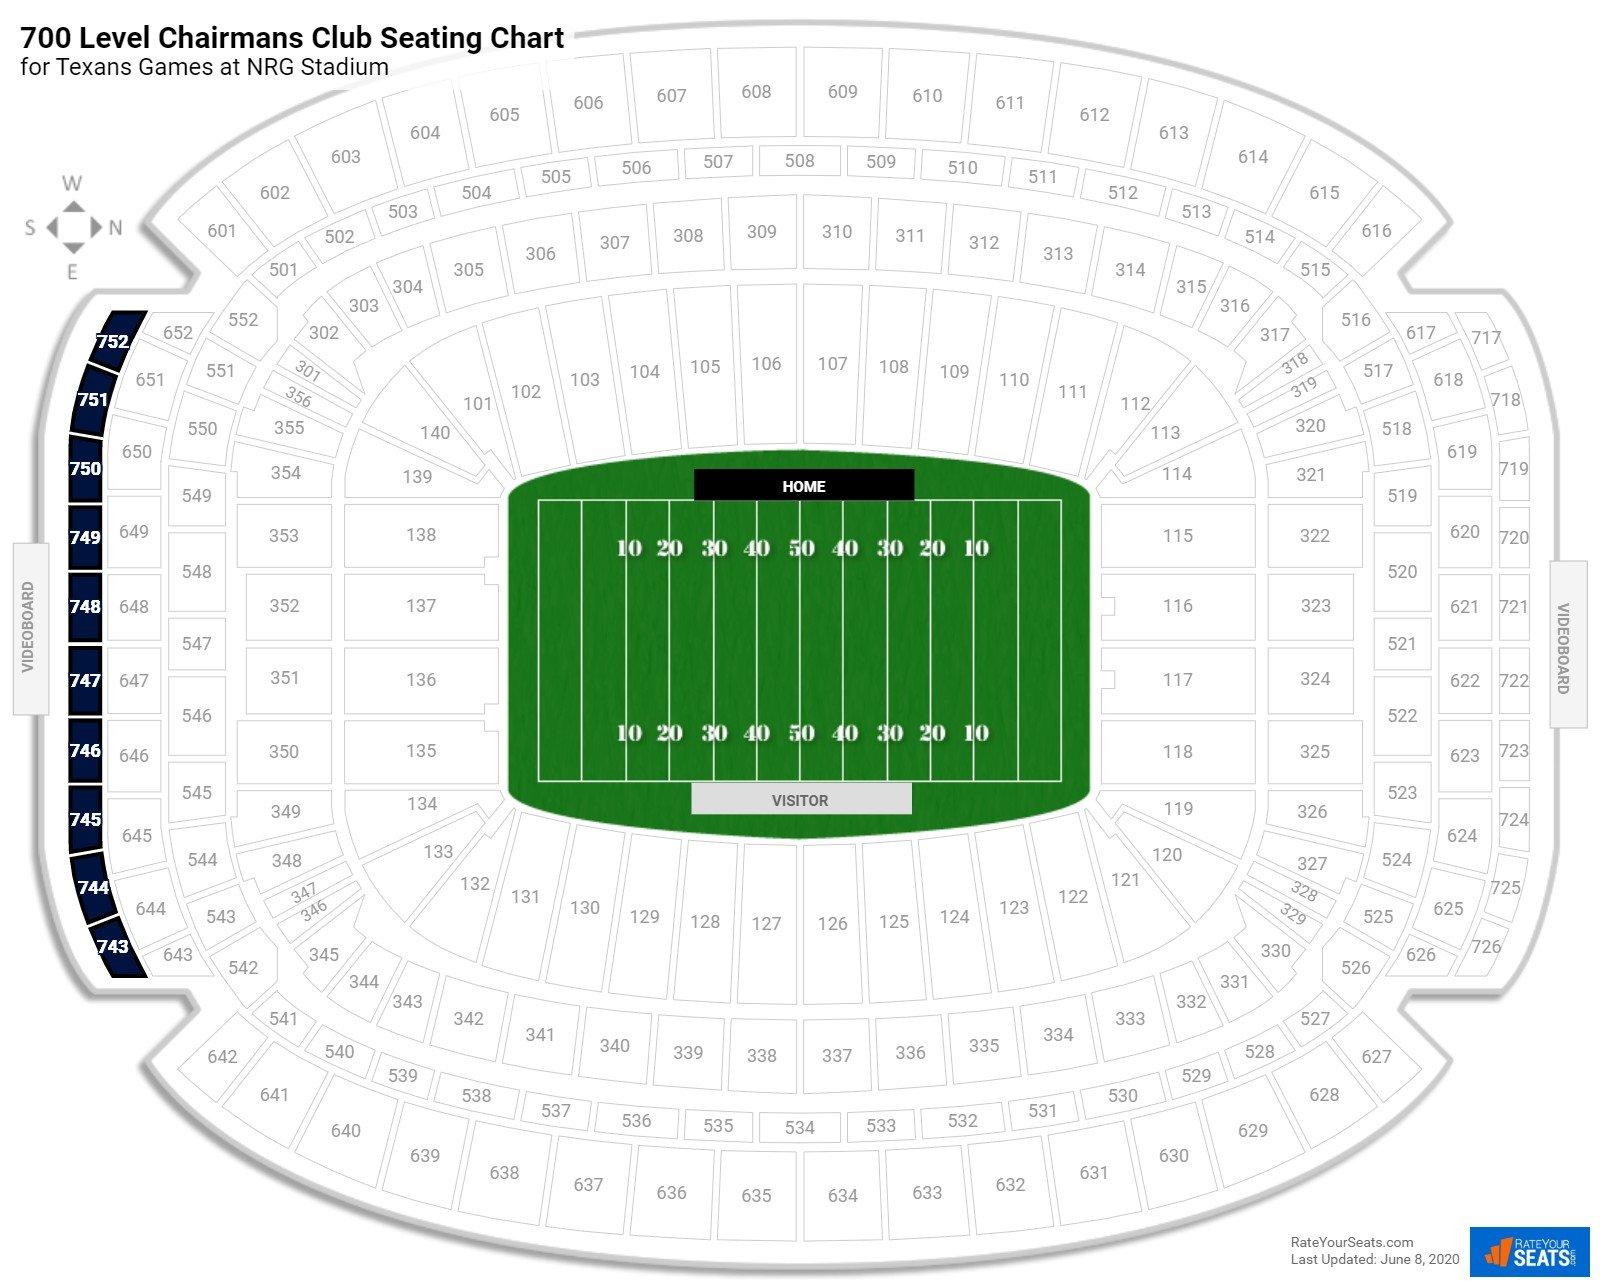 700 Level Chairmans Club Nrg Stadium Football Seating Rateyourseats Com